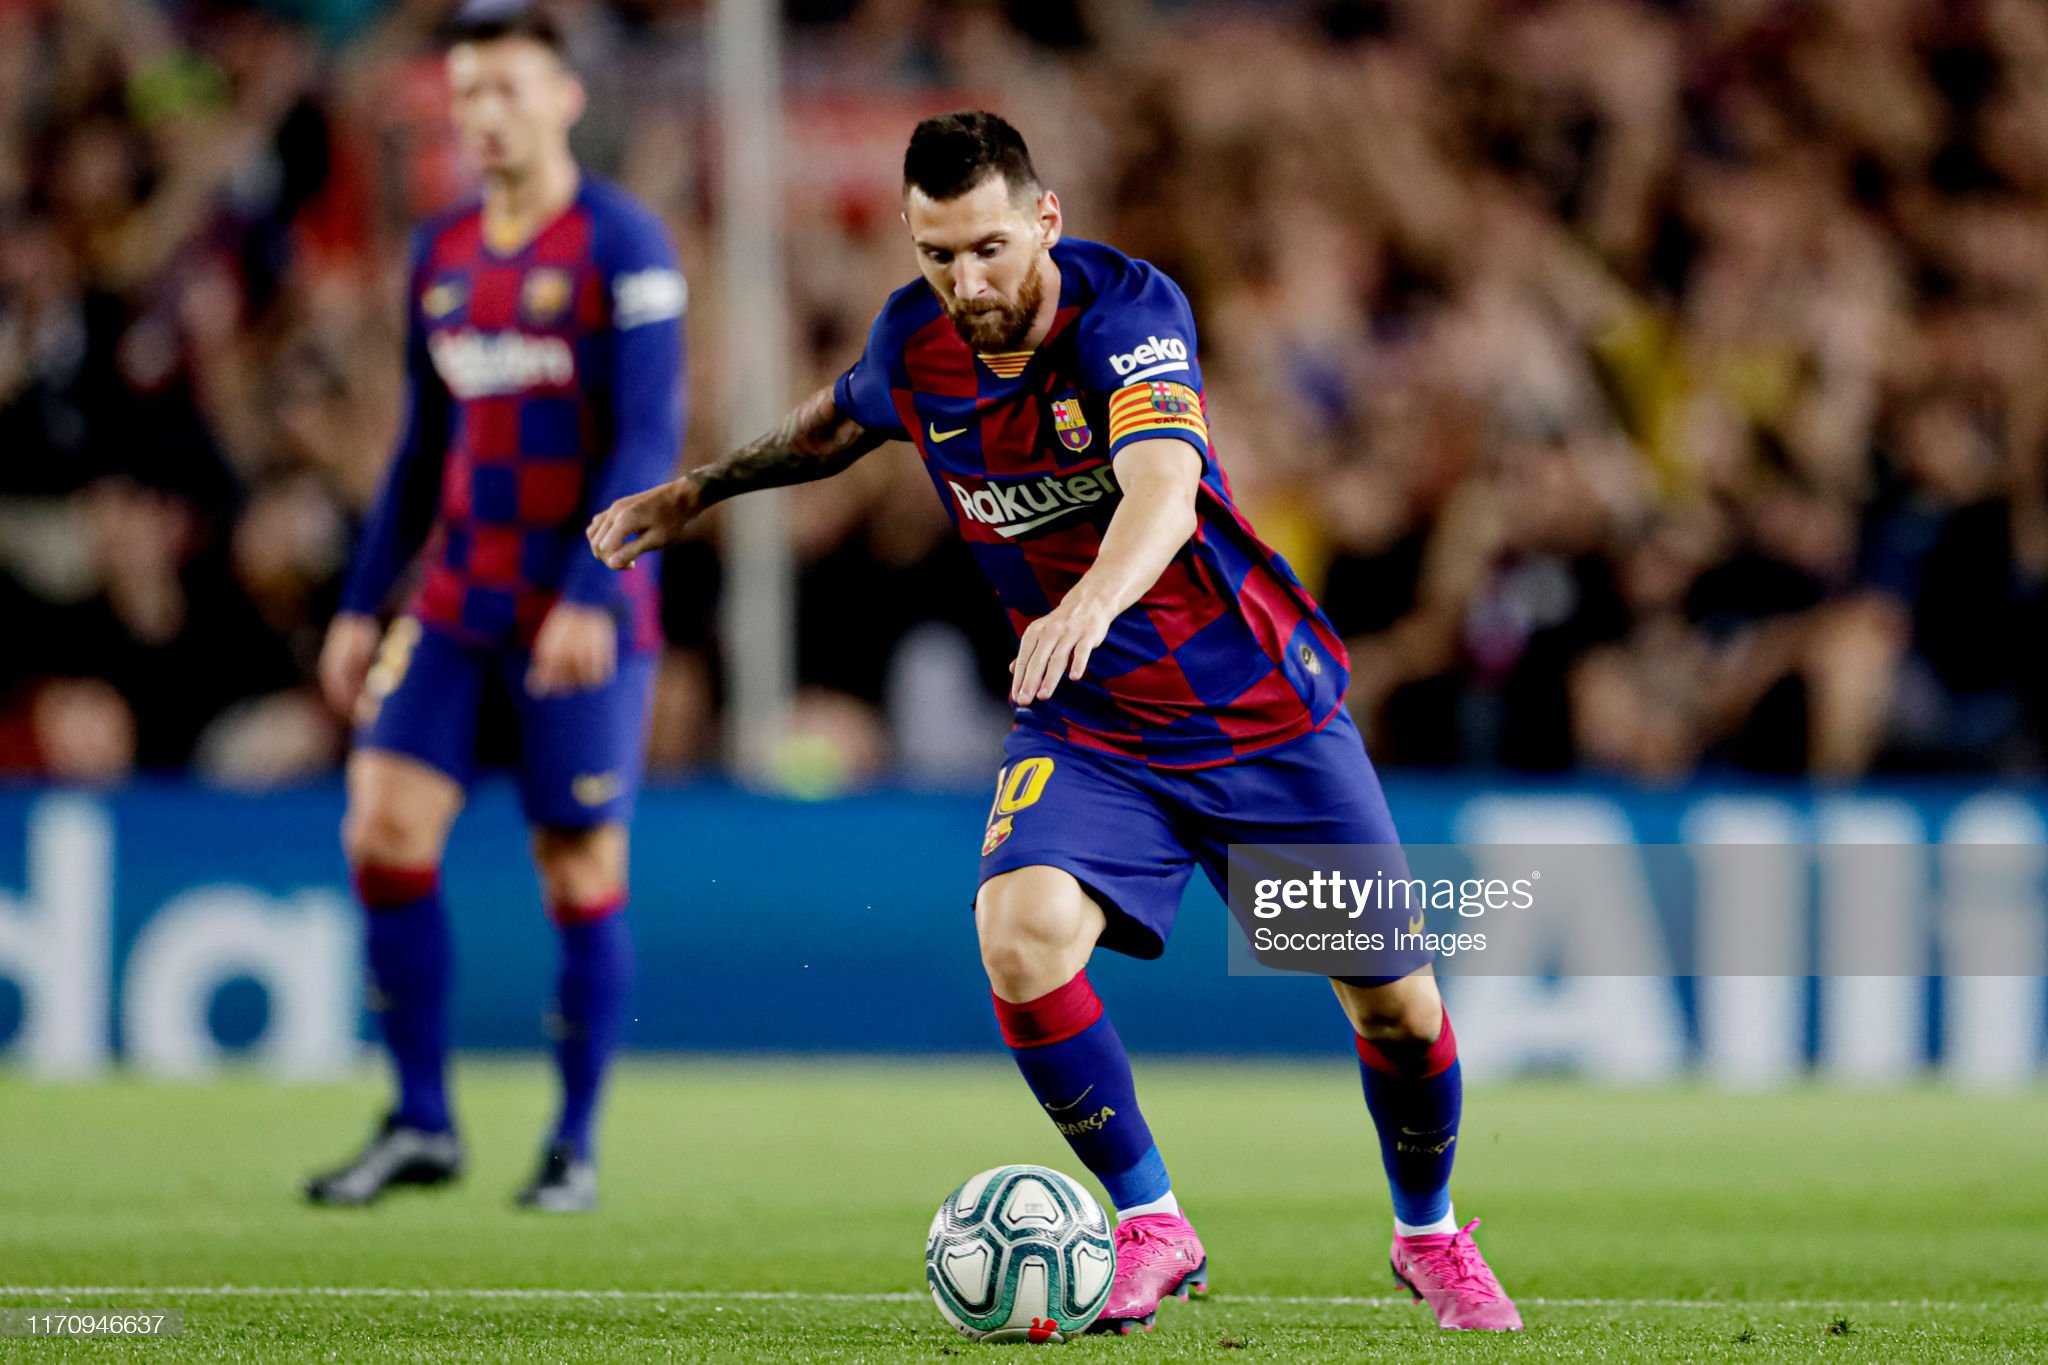 صور مباراة : برشلونة - فياريال 2-1 ( 24-09-2019 )  Lionel-messi-of-fc-barcelona-during-the-la-liga-santander-match-fc-picture-id1170946637?s=2048x2048